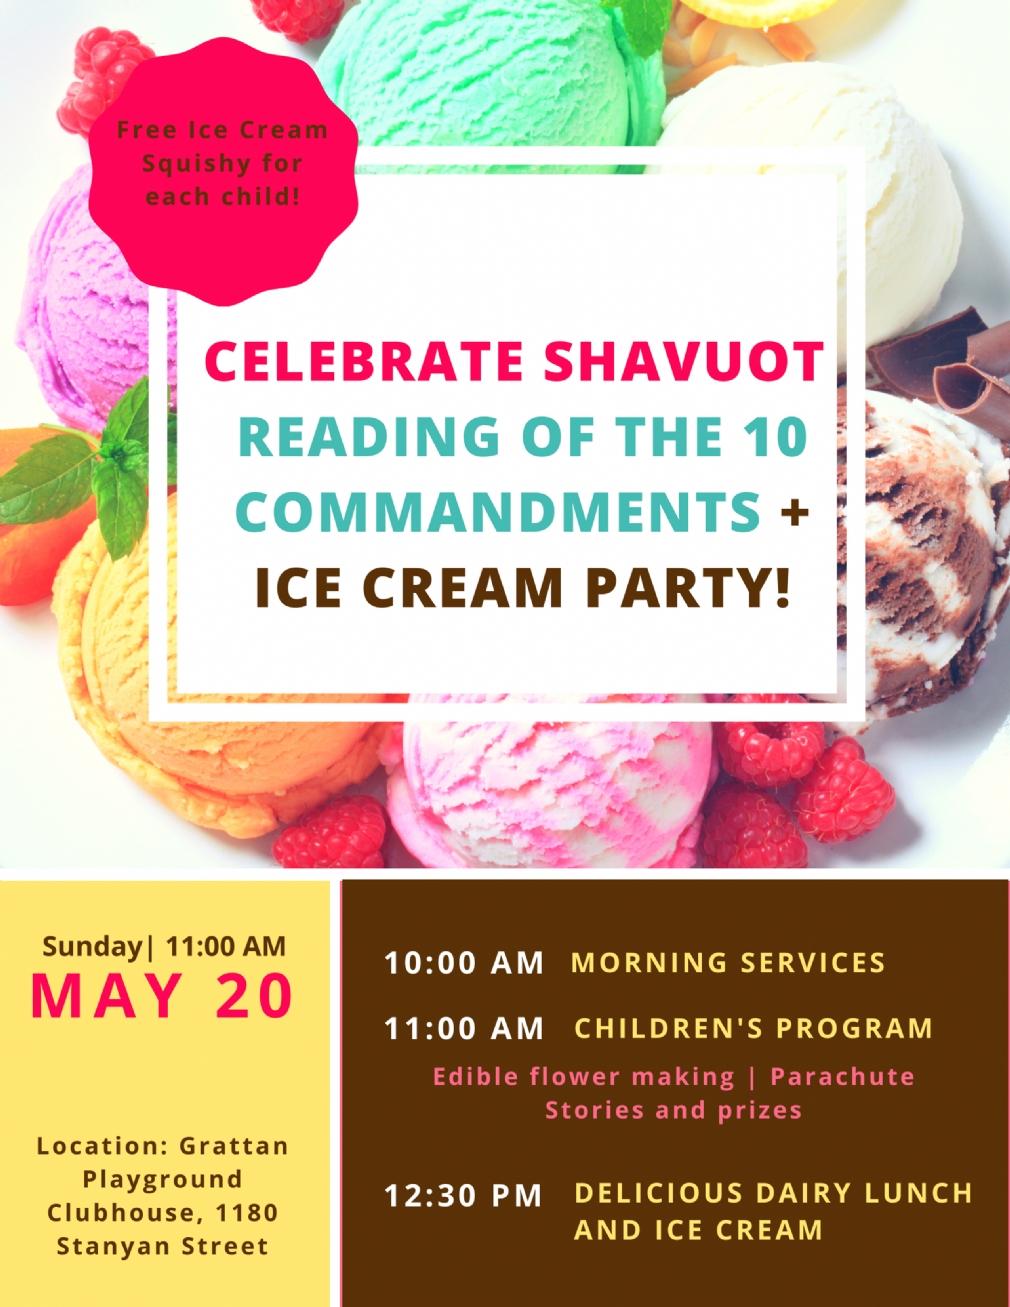 Shavuot Ice Cream Party flyer.jpg